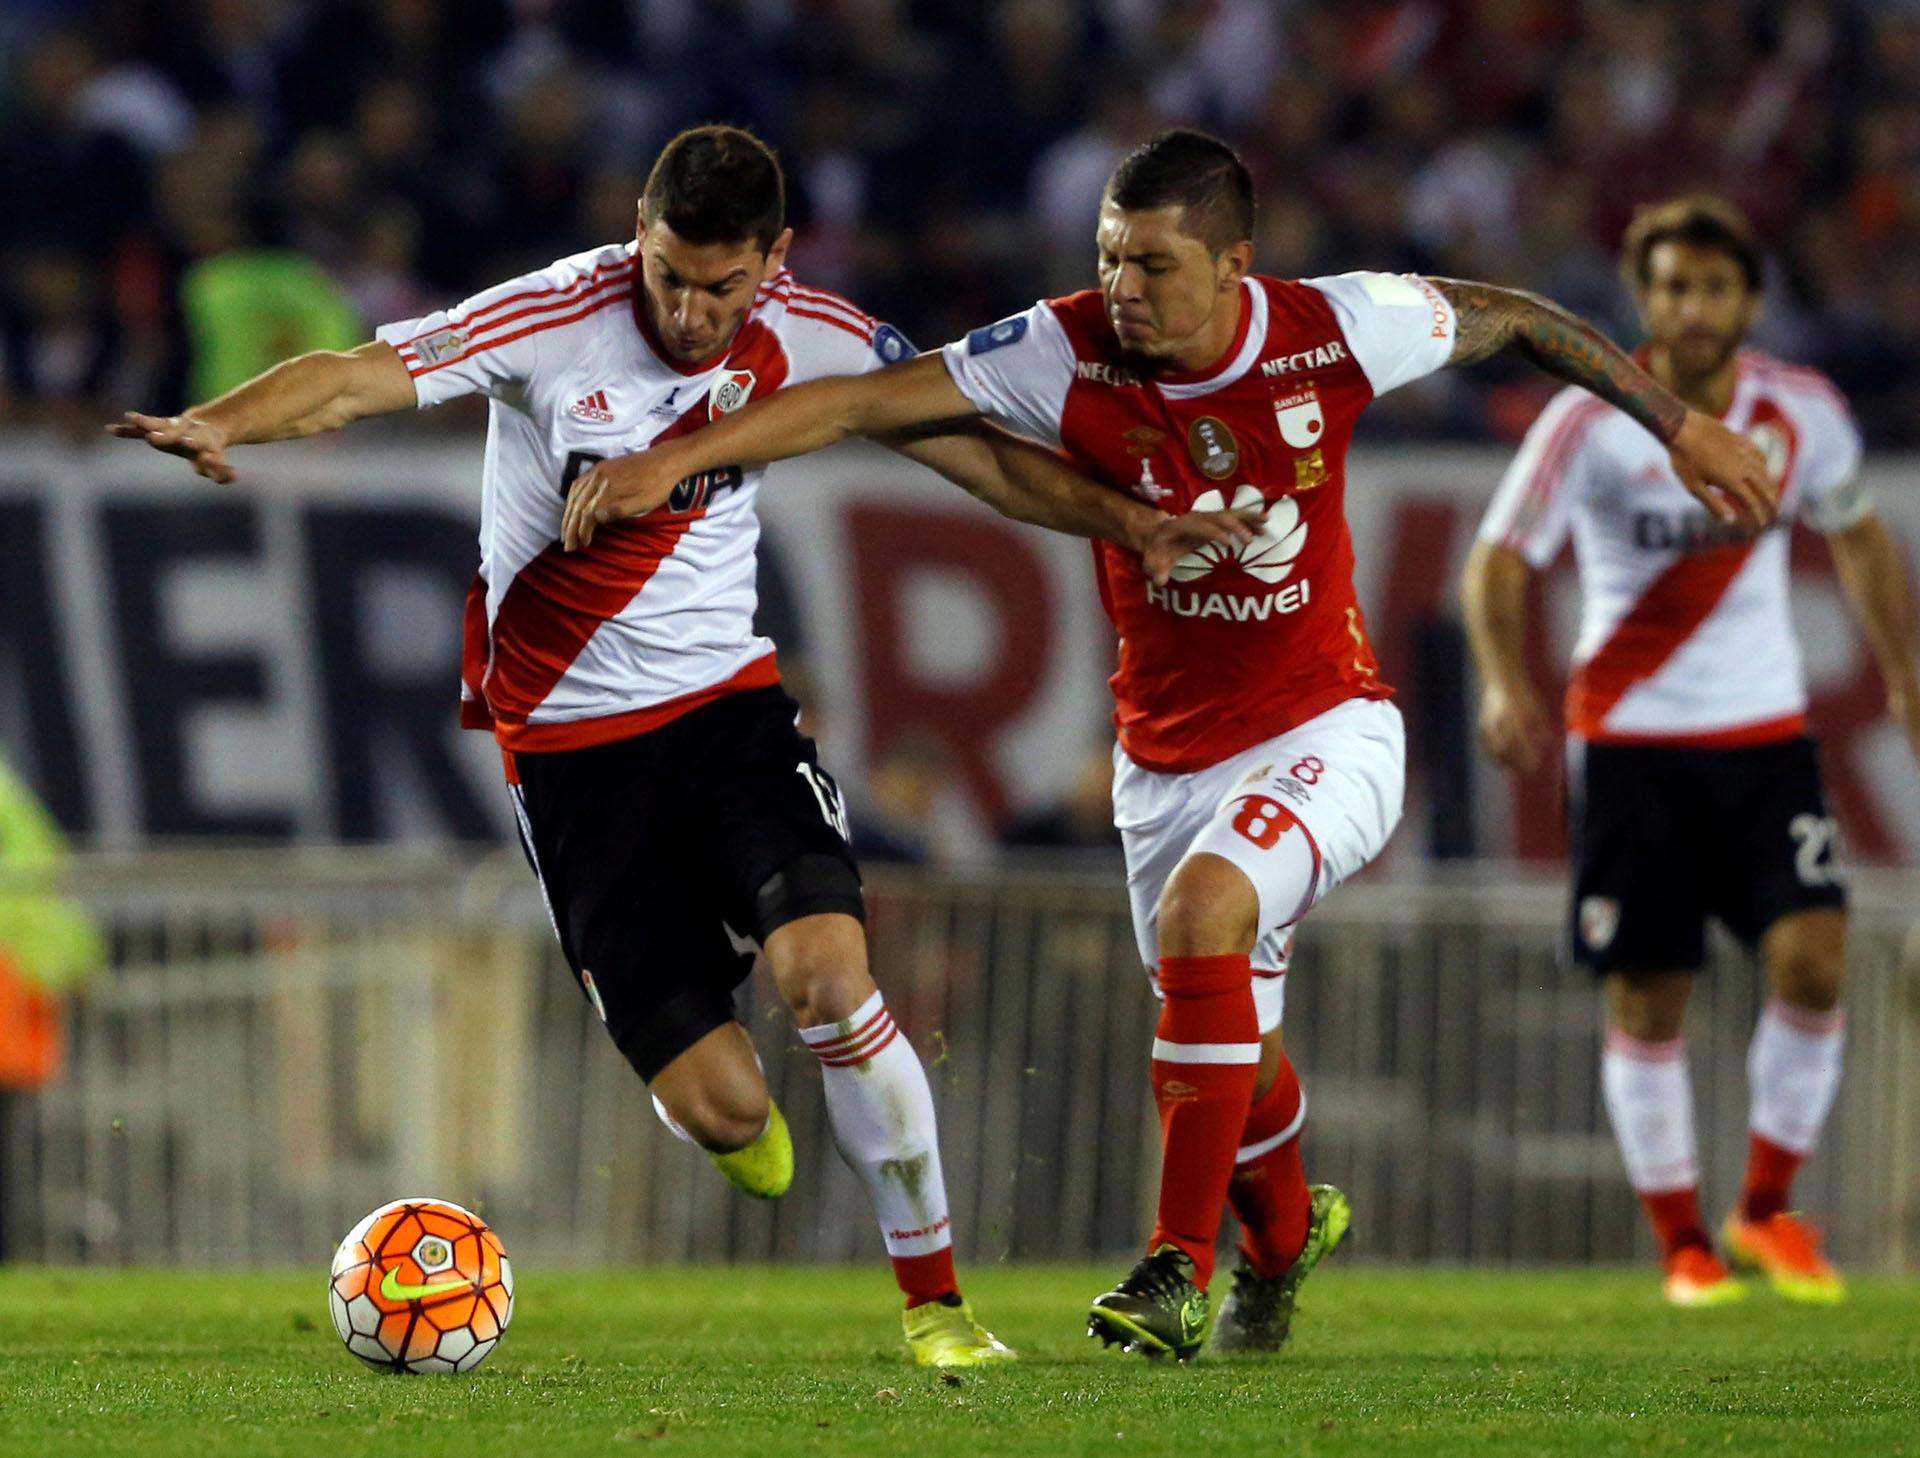 Leonardo Pico quiere recuperar la pelota ante Lucas Alario, detrás observa Leonardo Ponzio(Reuters)